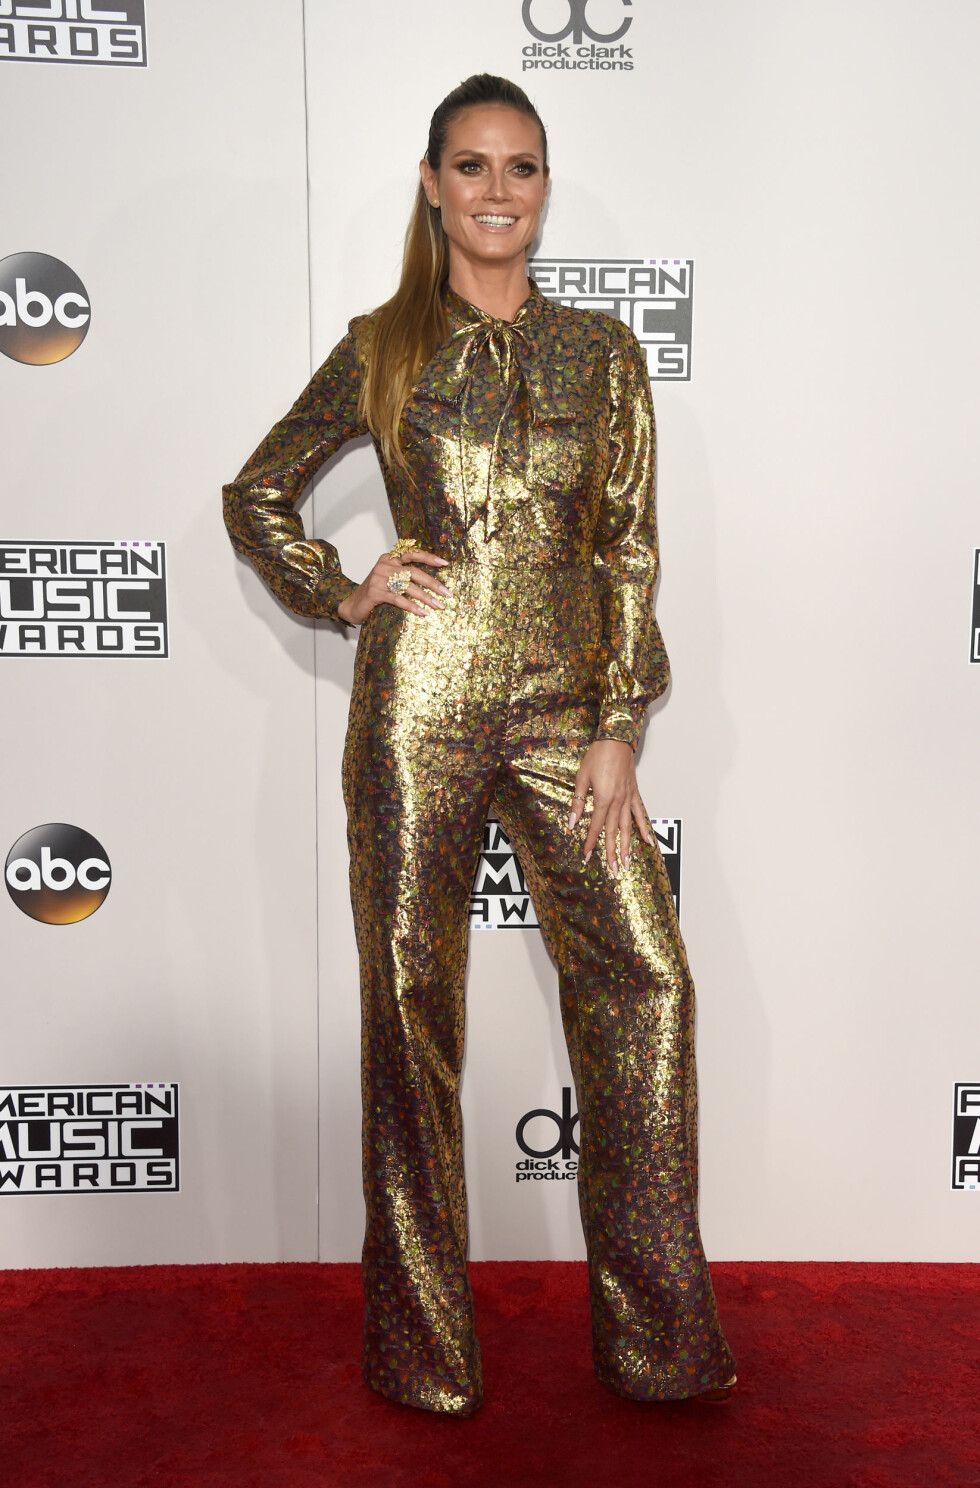 AMERICAN MUSIC AWARDS: Heidi Klum Foto: Pa Photos